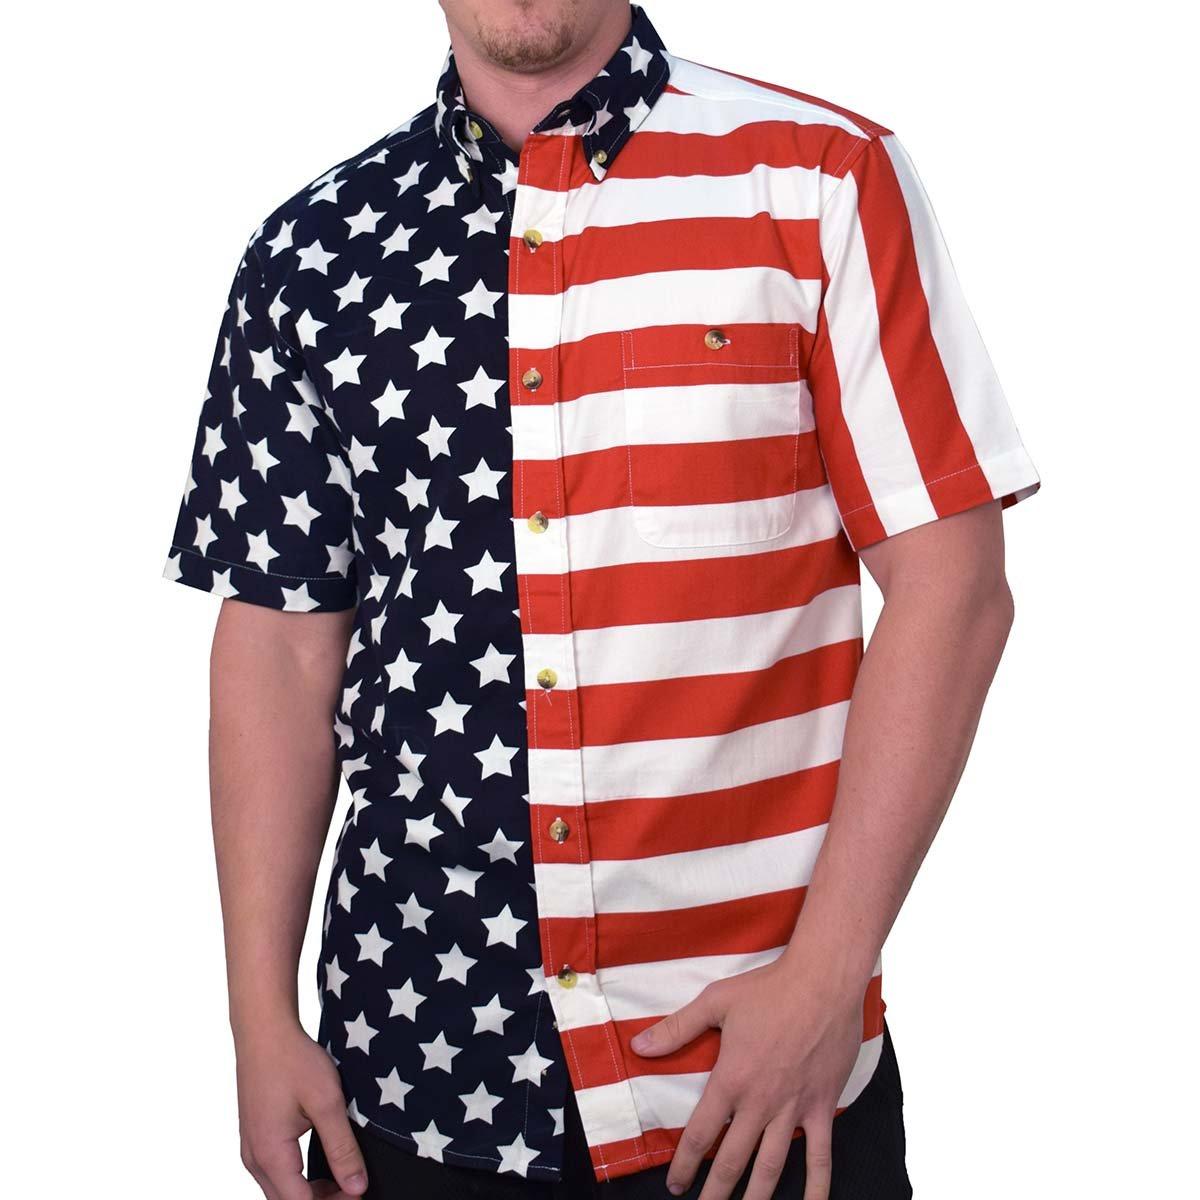 a751b1b5e8 Men's American Flag Shirt